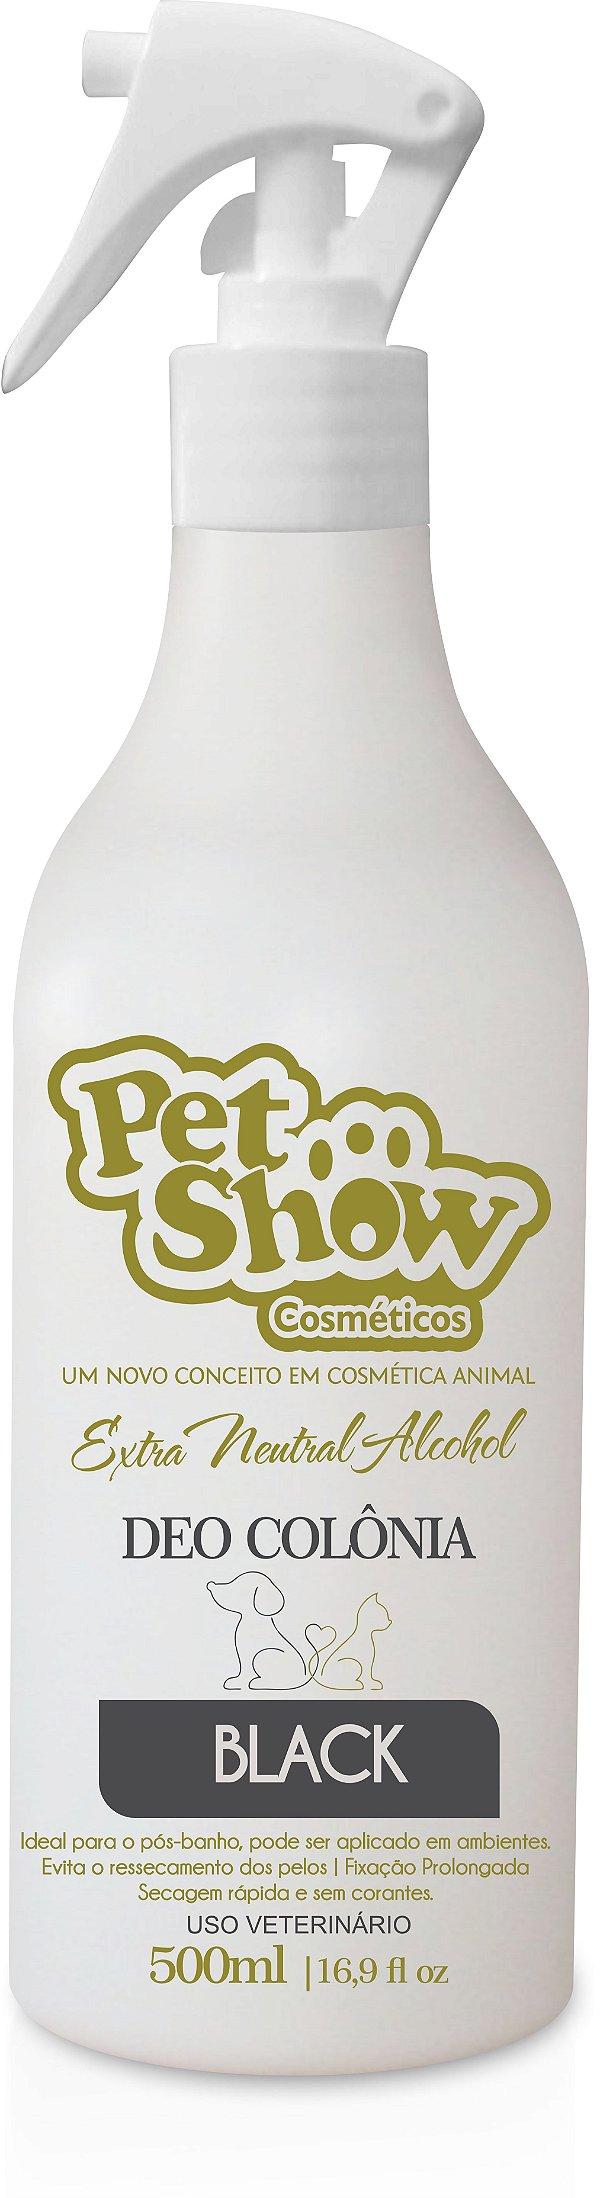 DEO COLONIA BLACK 500 ML - PET SHOW